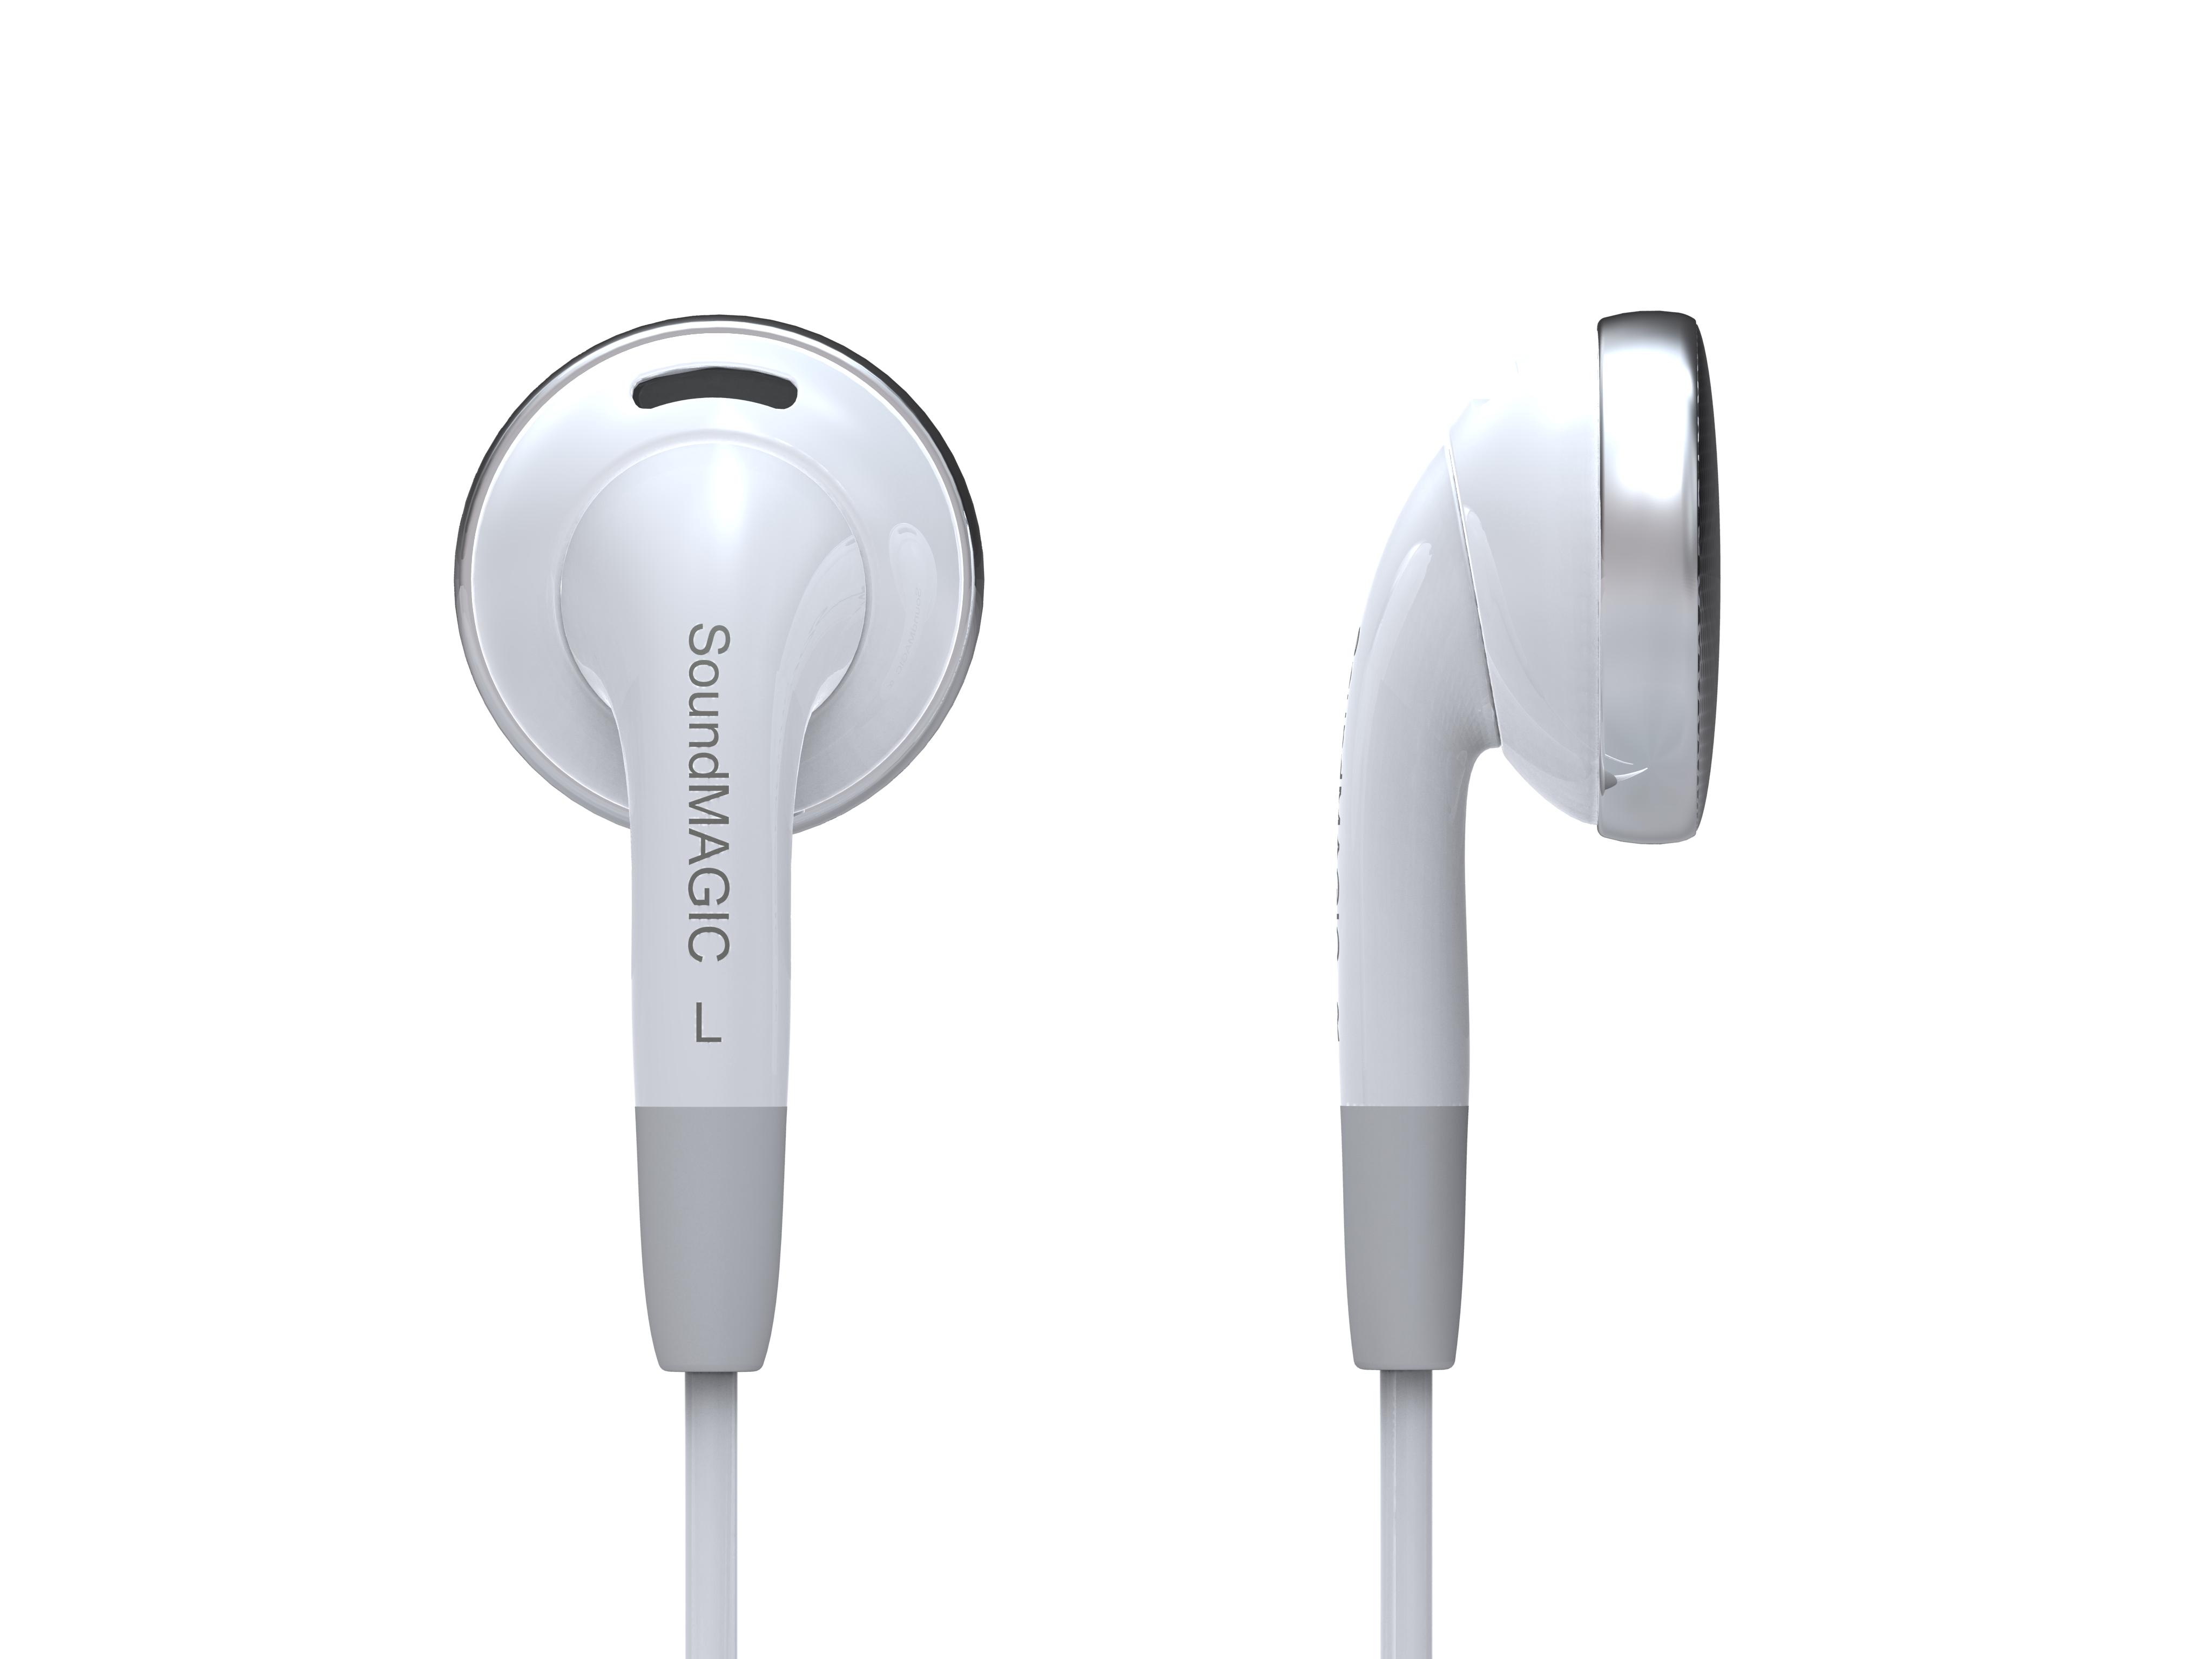 Soundmagic EP30 หูฟัง Dynamic Stereo Earbuds สีขาว ของแท้ ประกันศูนย์ 1ปี (White)